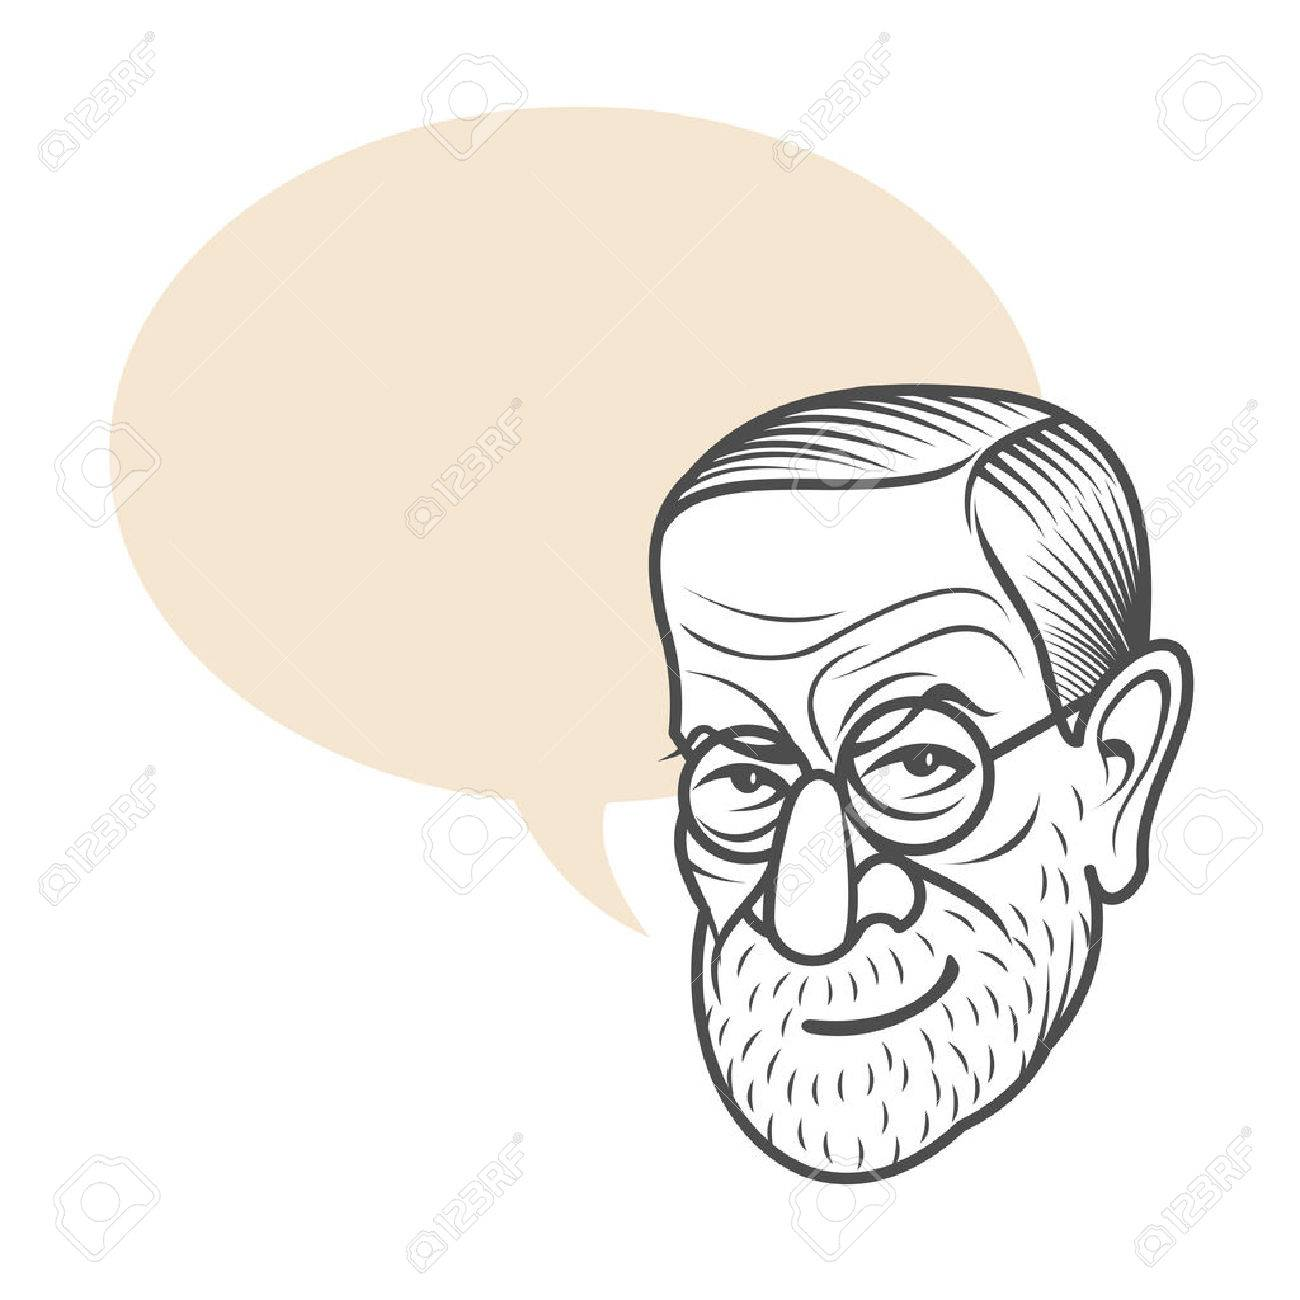 Vector Cartoon Caricature Portrait Of Sigmund Freud. Vector Template ...